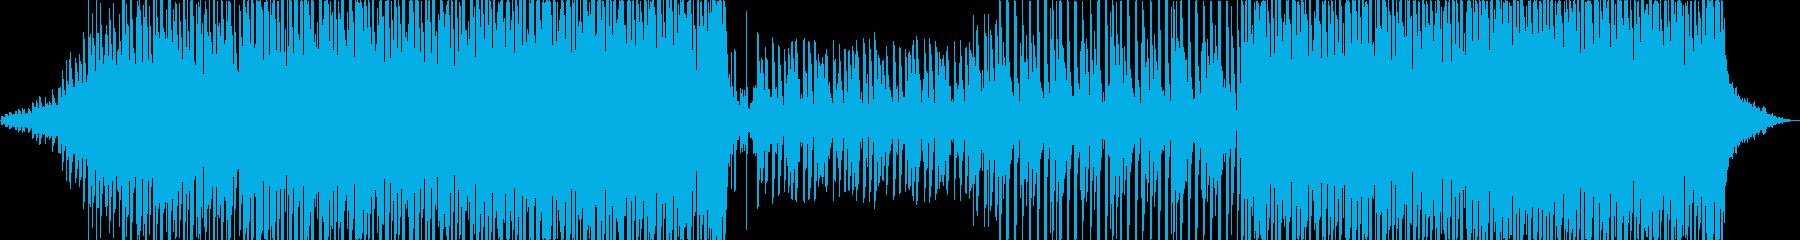 Motivational musicの再生済みの波形